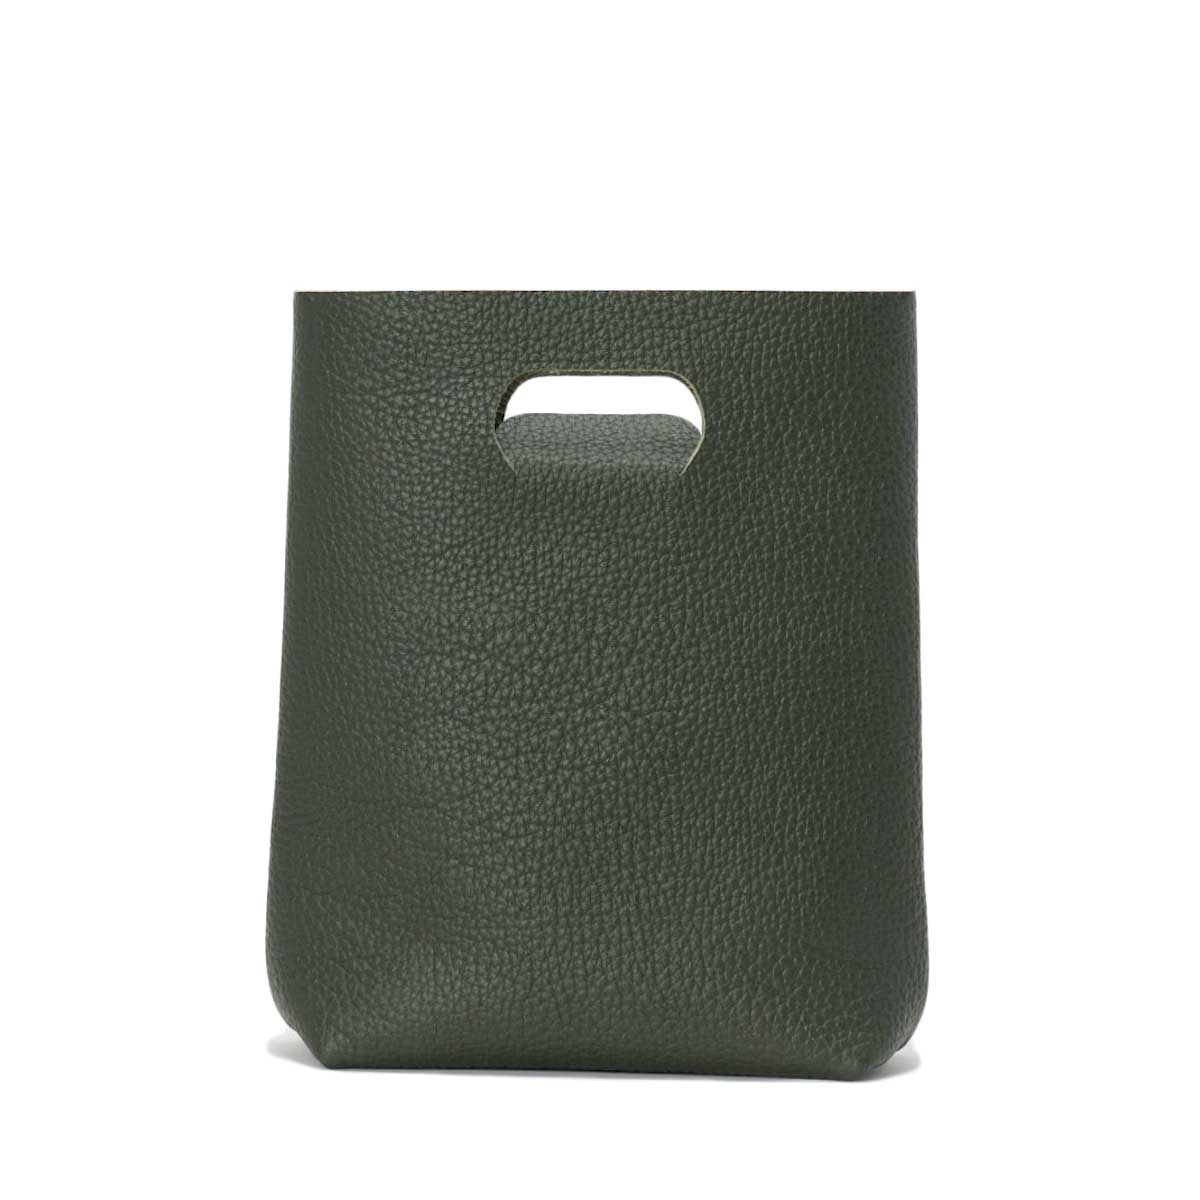 Hender Scheme / not eco bag small (Dark Green)